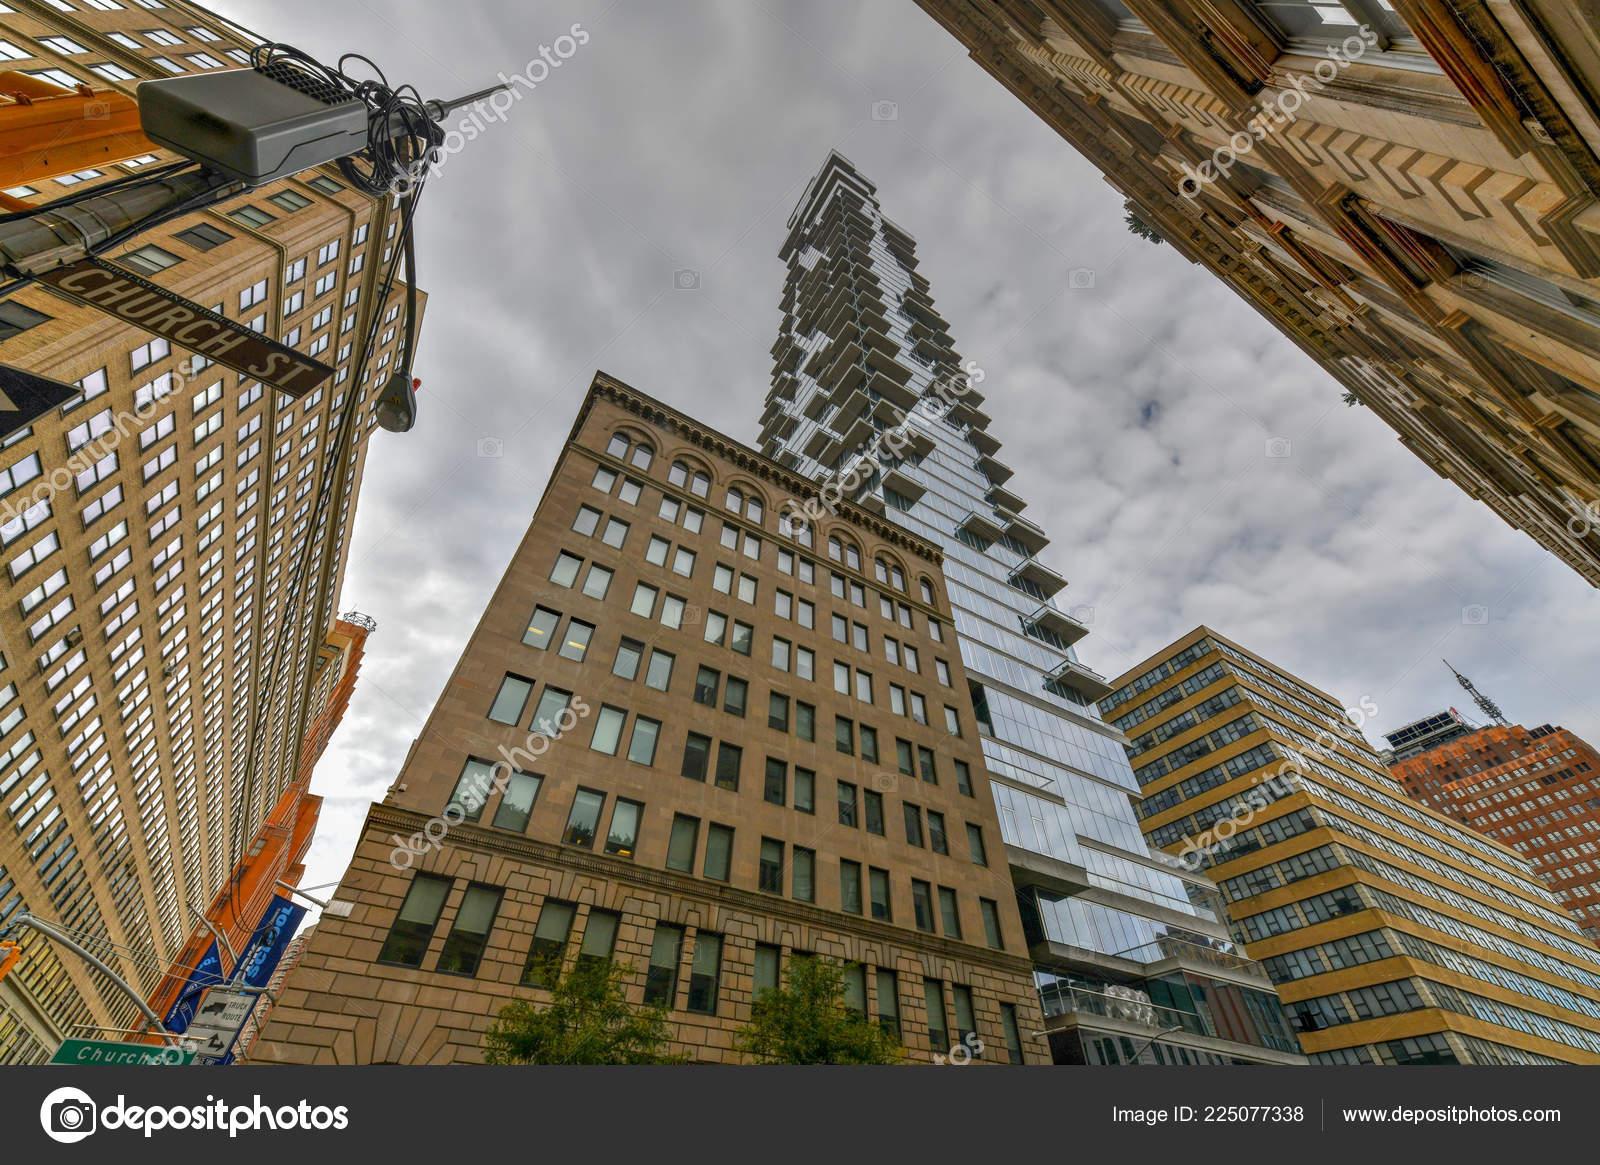 New York City Oct 2018 Leonard Street Tallest Building Tribeca